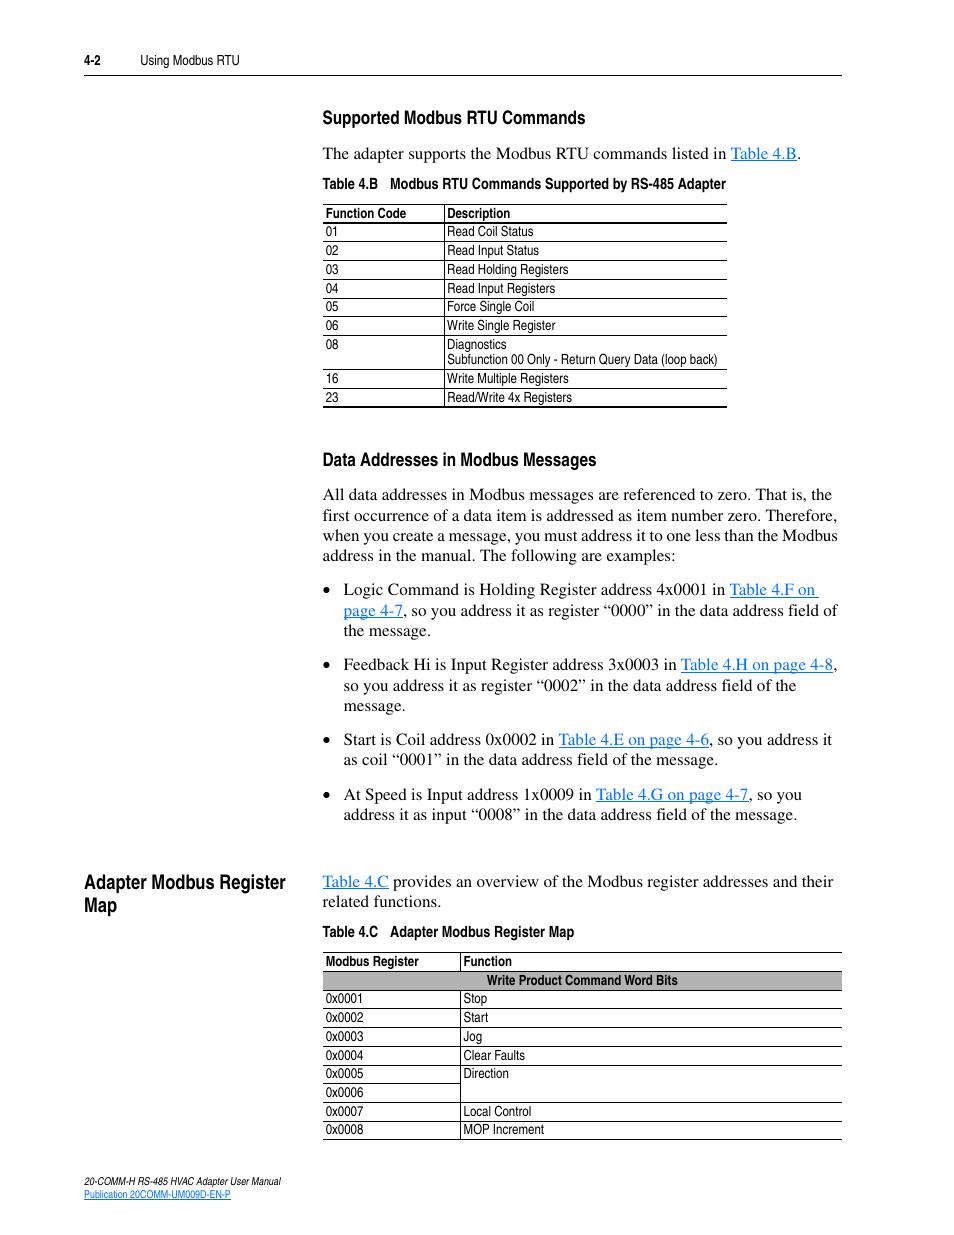 Supported modbus rtu commands, Data addresses in modbus